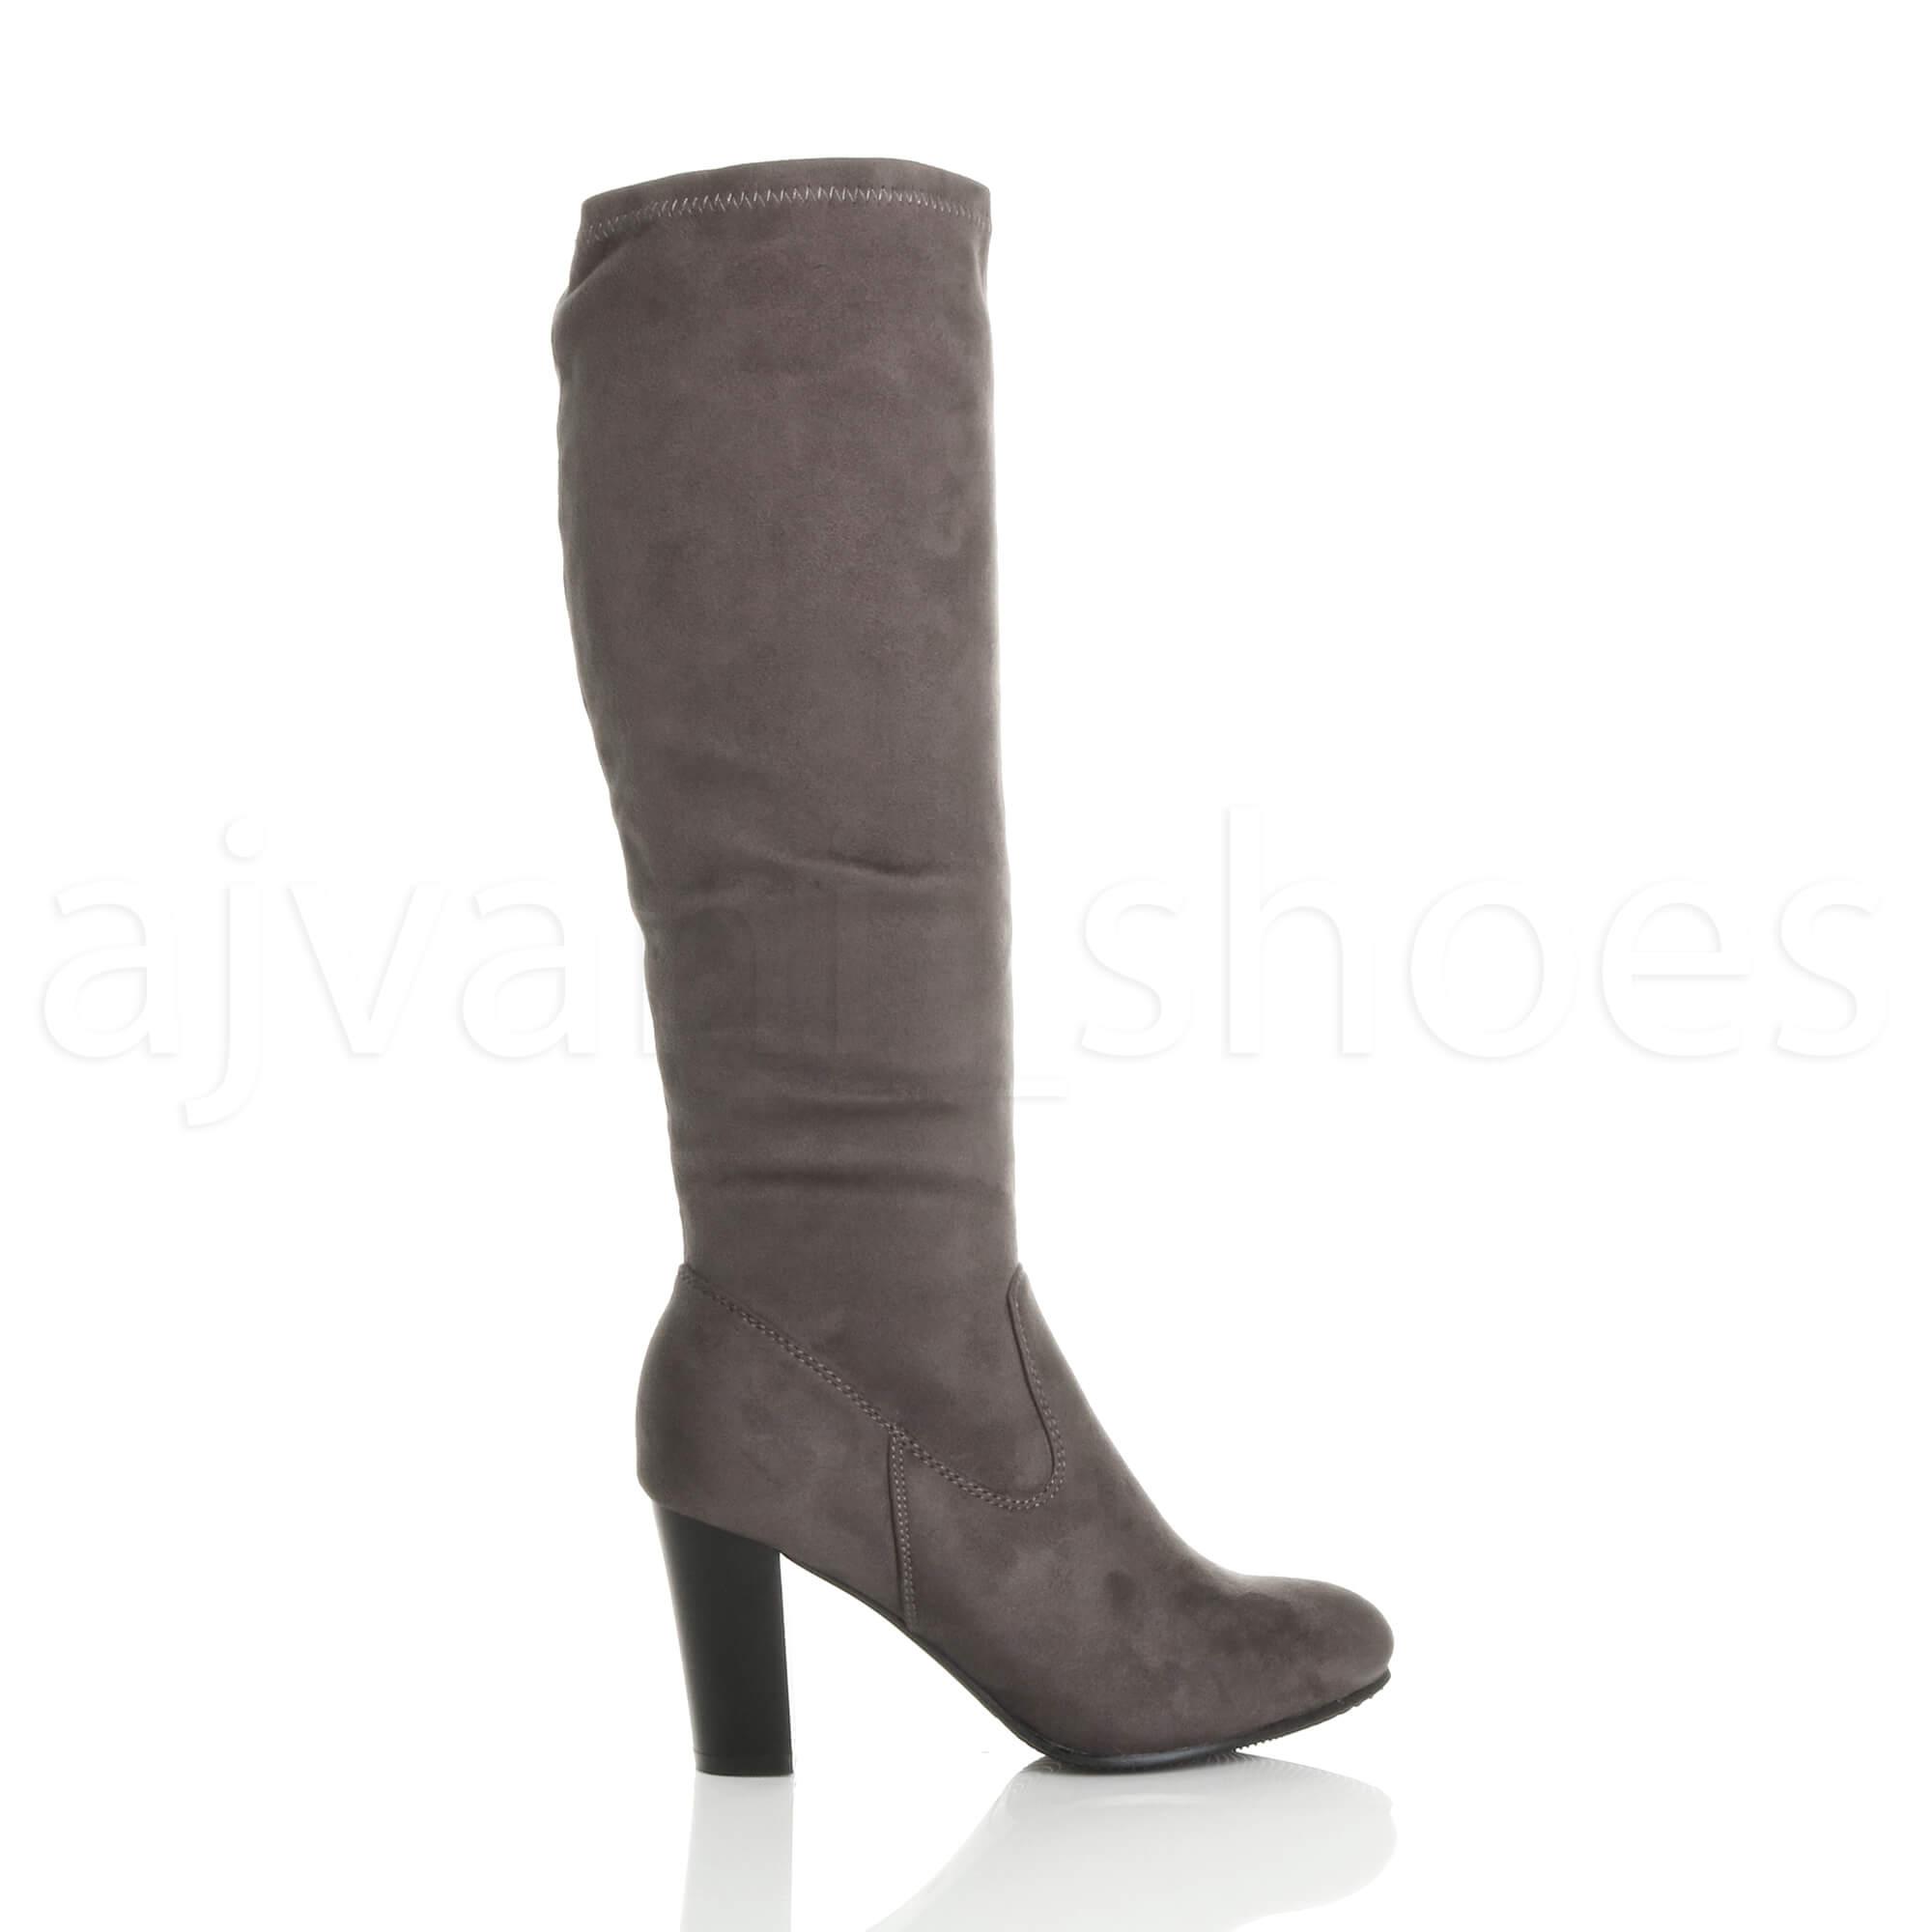 WOMENS-LADIES-HIGH-BLOCK-HEEL-STRETCH-ZIP-SOCK-SMART-RIDING-CALF-KNEE-BOOTS-SIZE